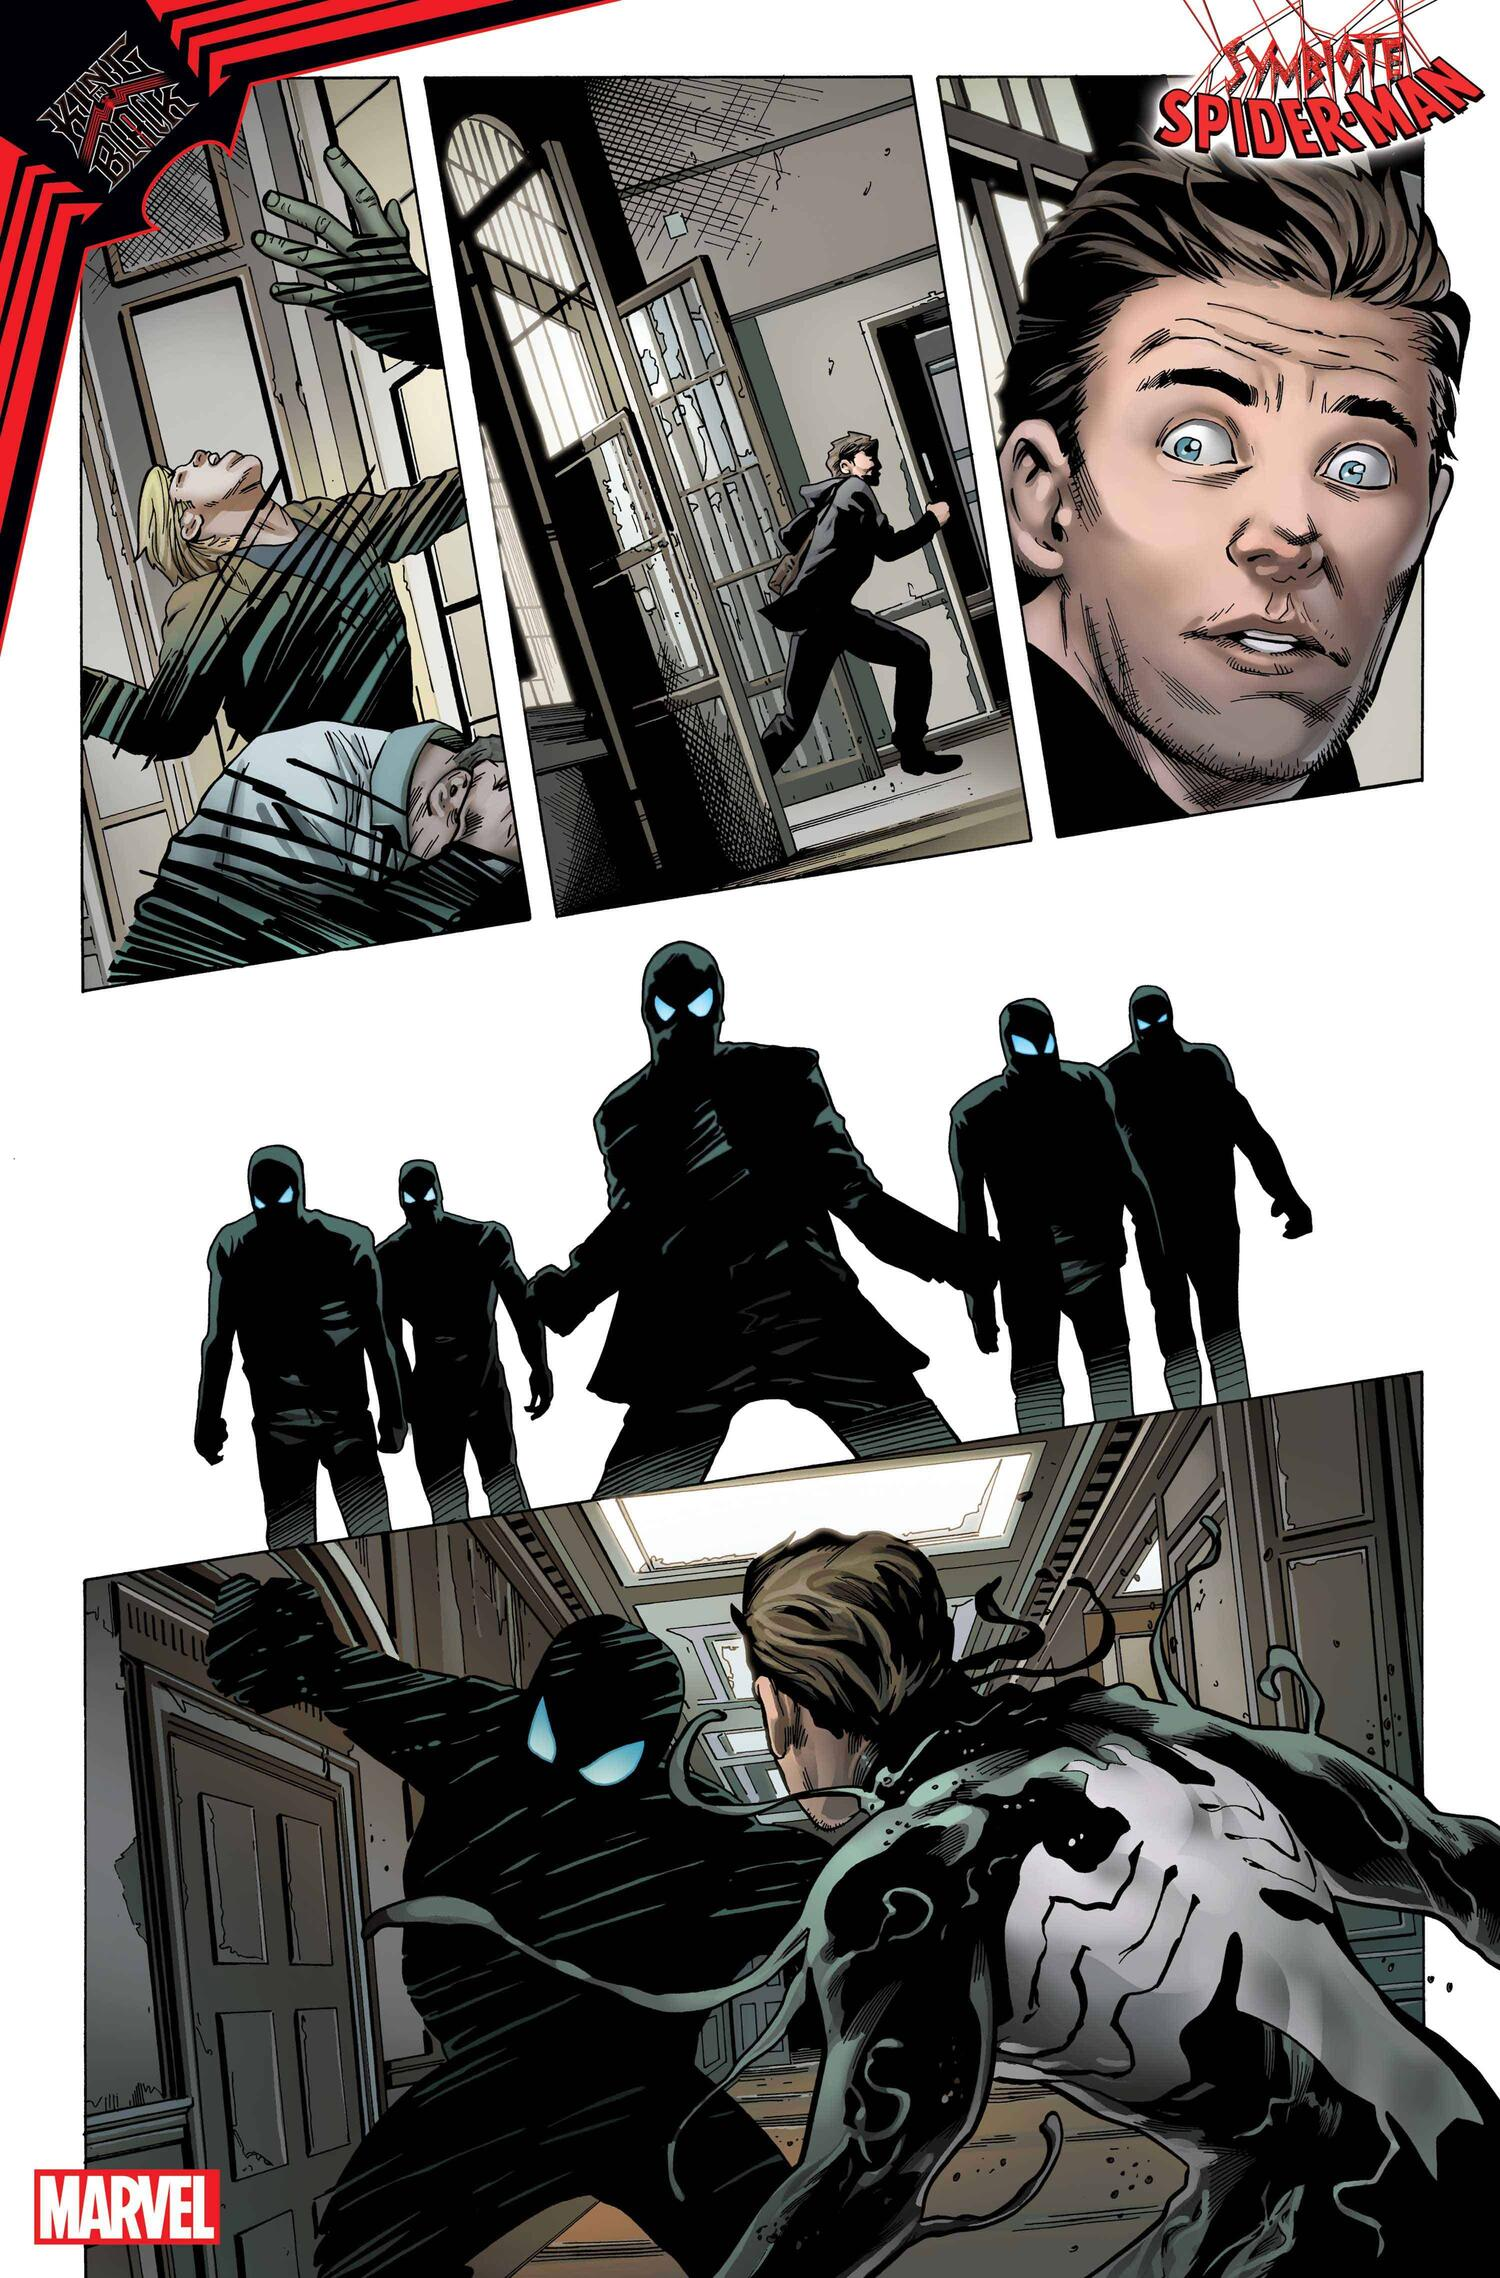 SYMBIOTE SPIDER-MAN: KING IN BLACK (2020) #1